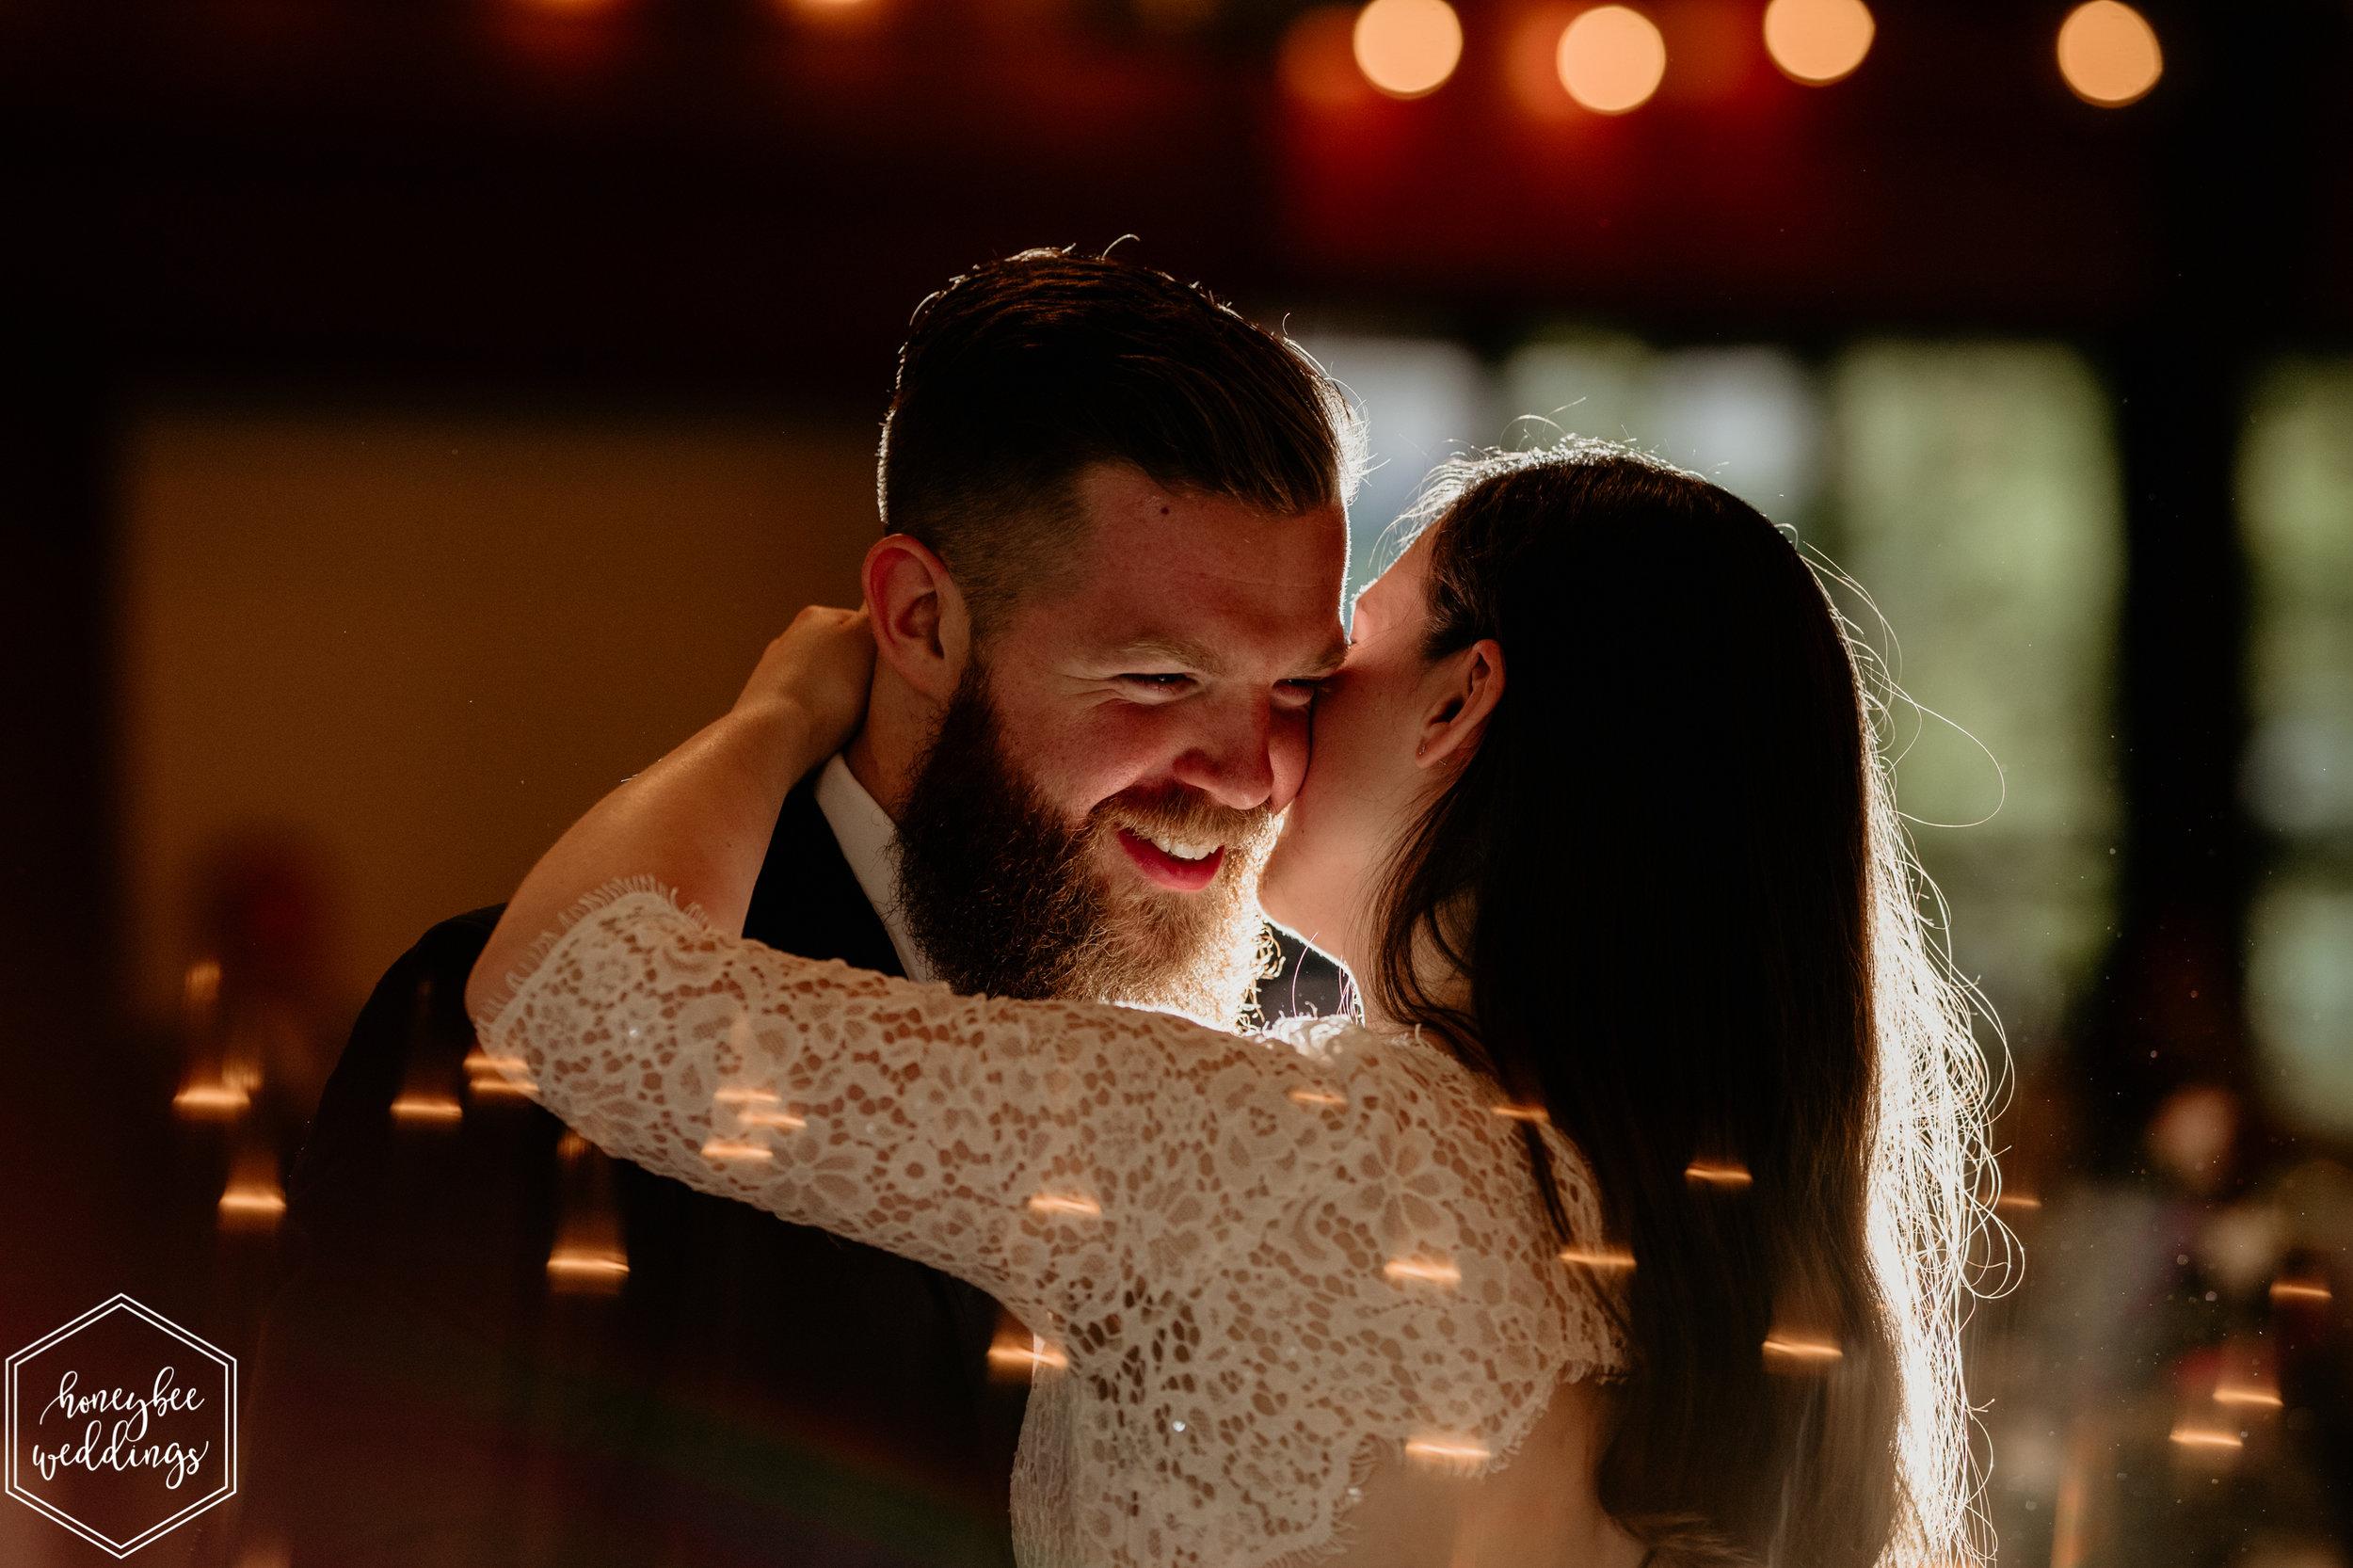 189Glacier National Park Wedding_Izaak Walton Inn Wedding_Honeybee Weddings_Norah & Kyle_June 08, 2019-2694.jpg